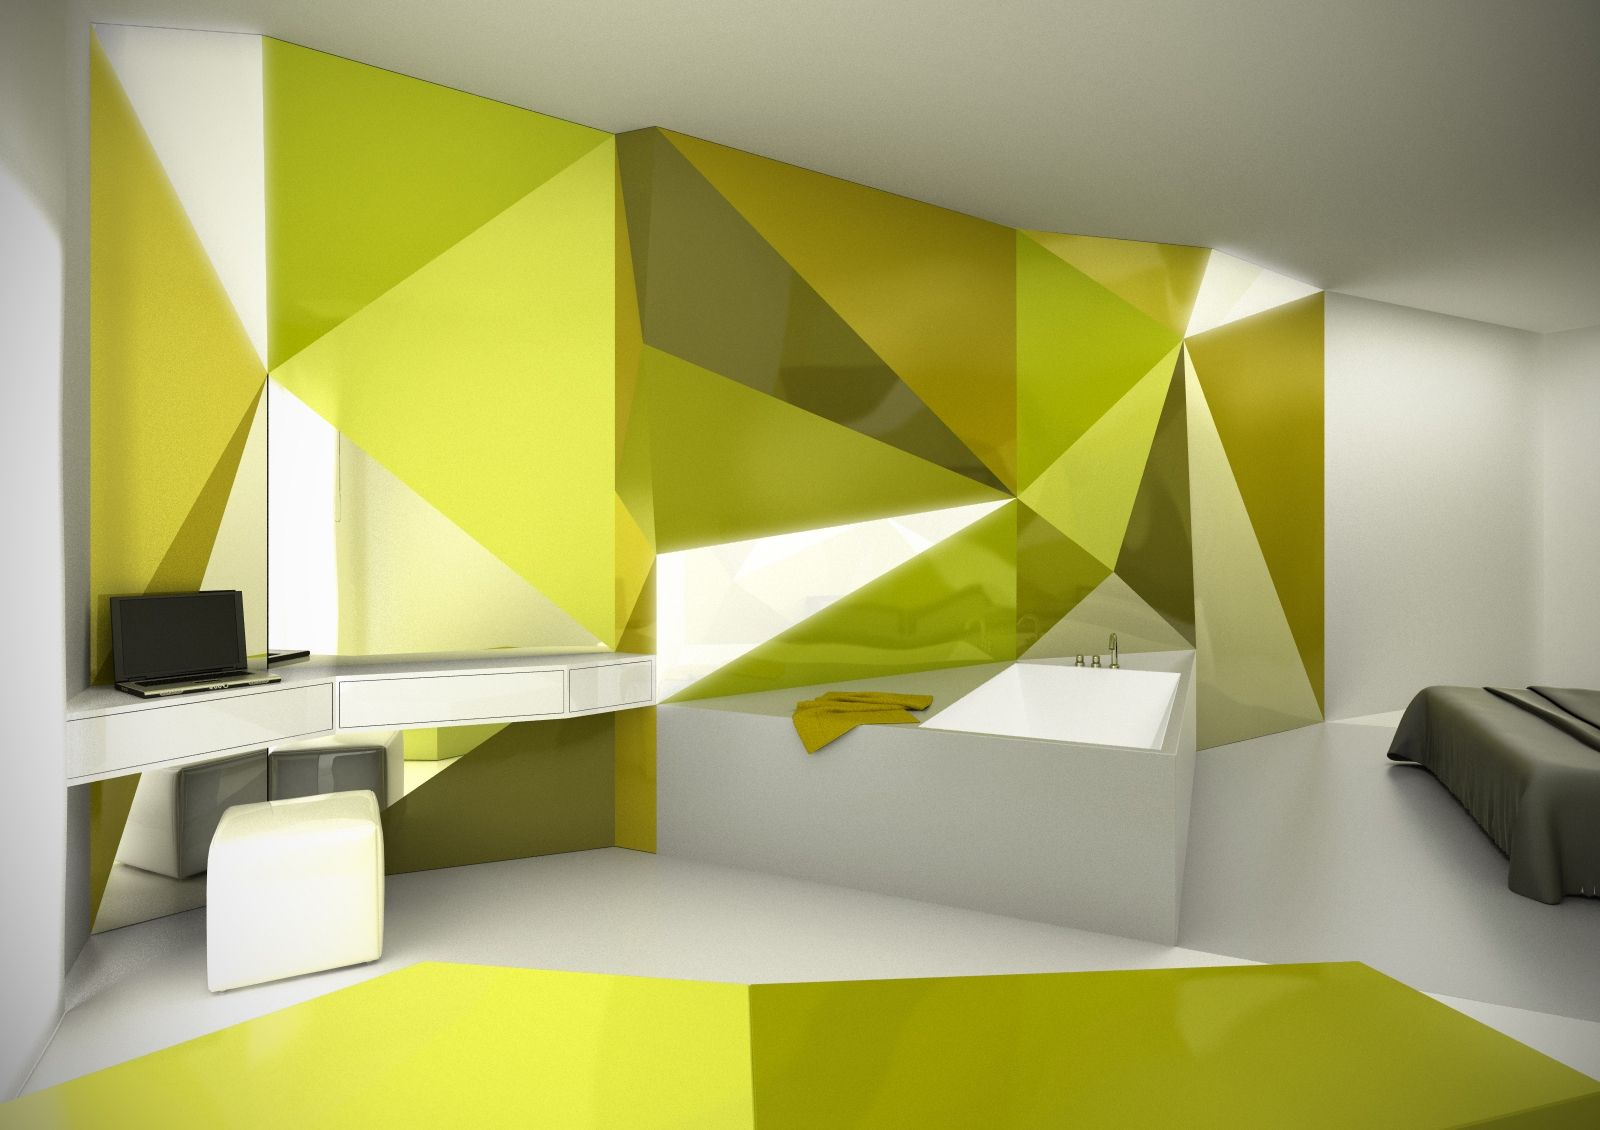 angular interior walls - Google Search | Decorative walls ideas ...